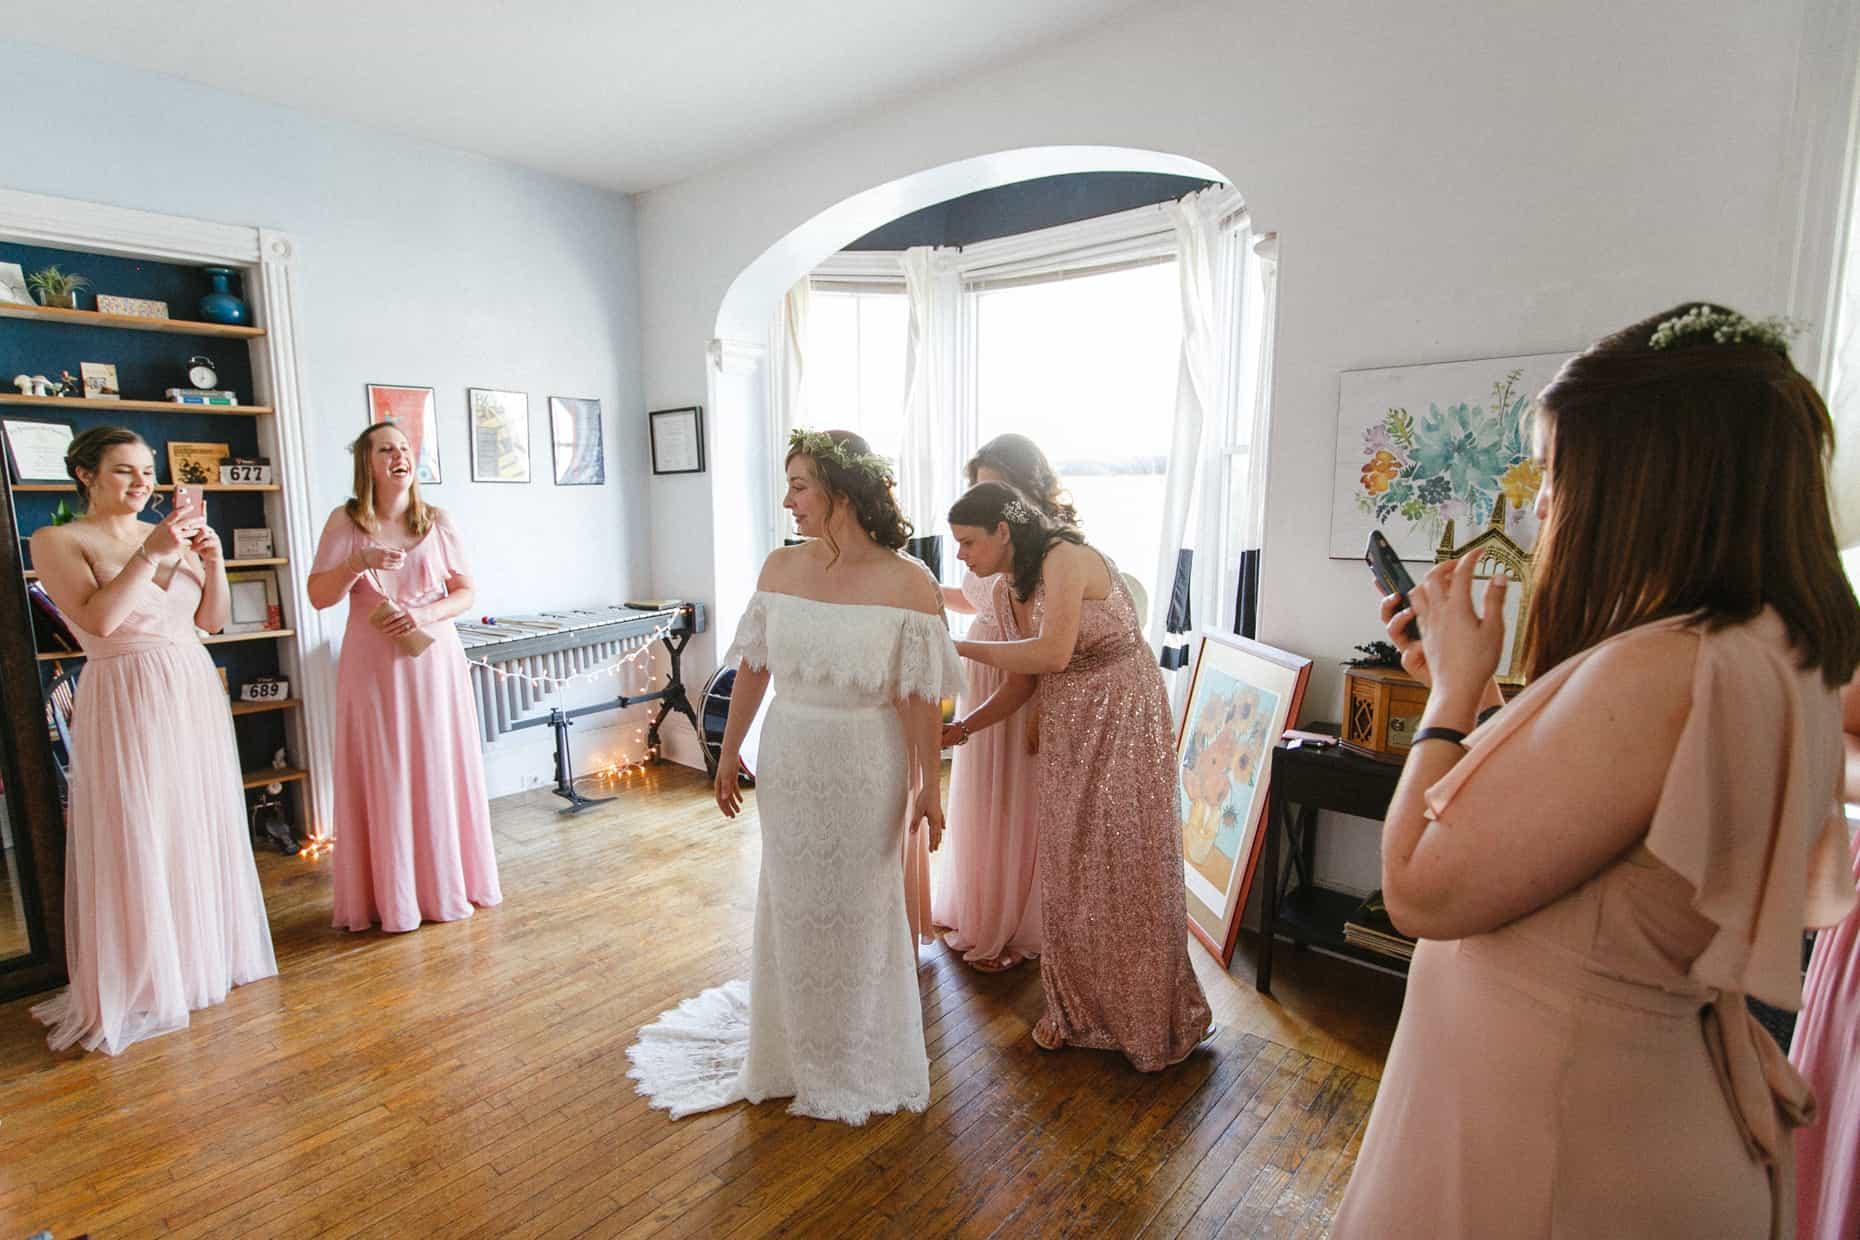 Phoenixville PA weddings